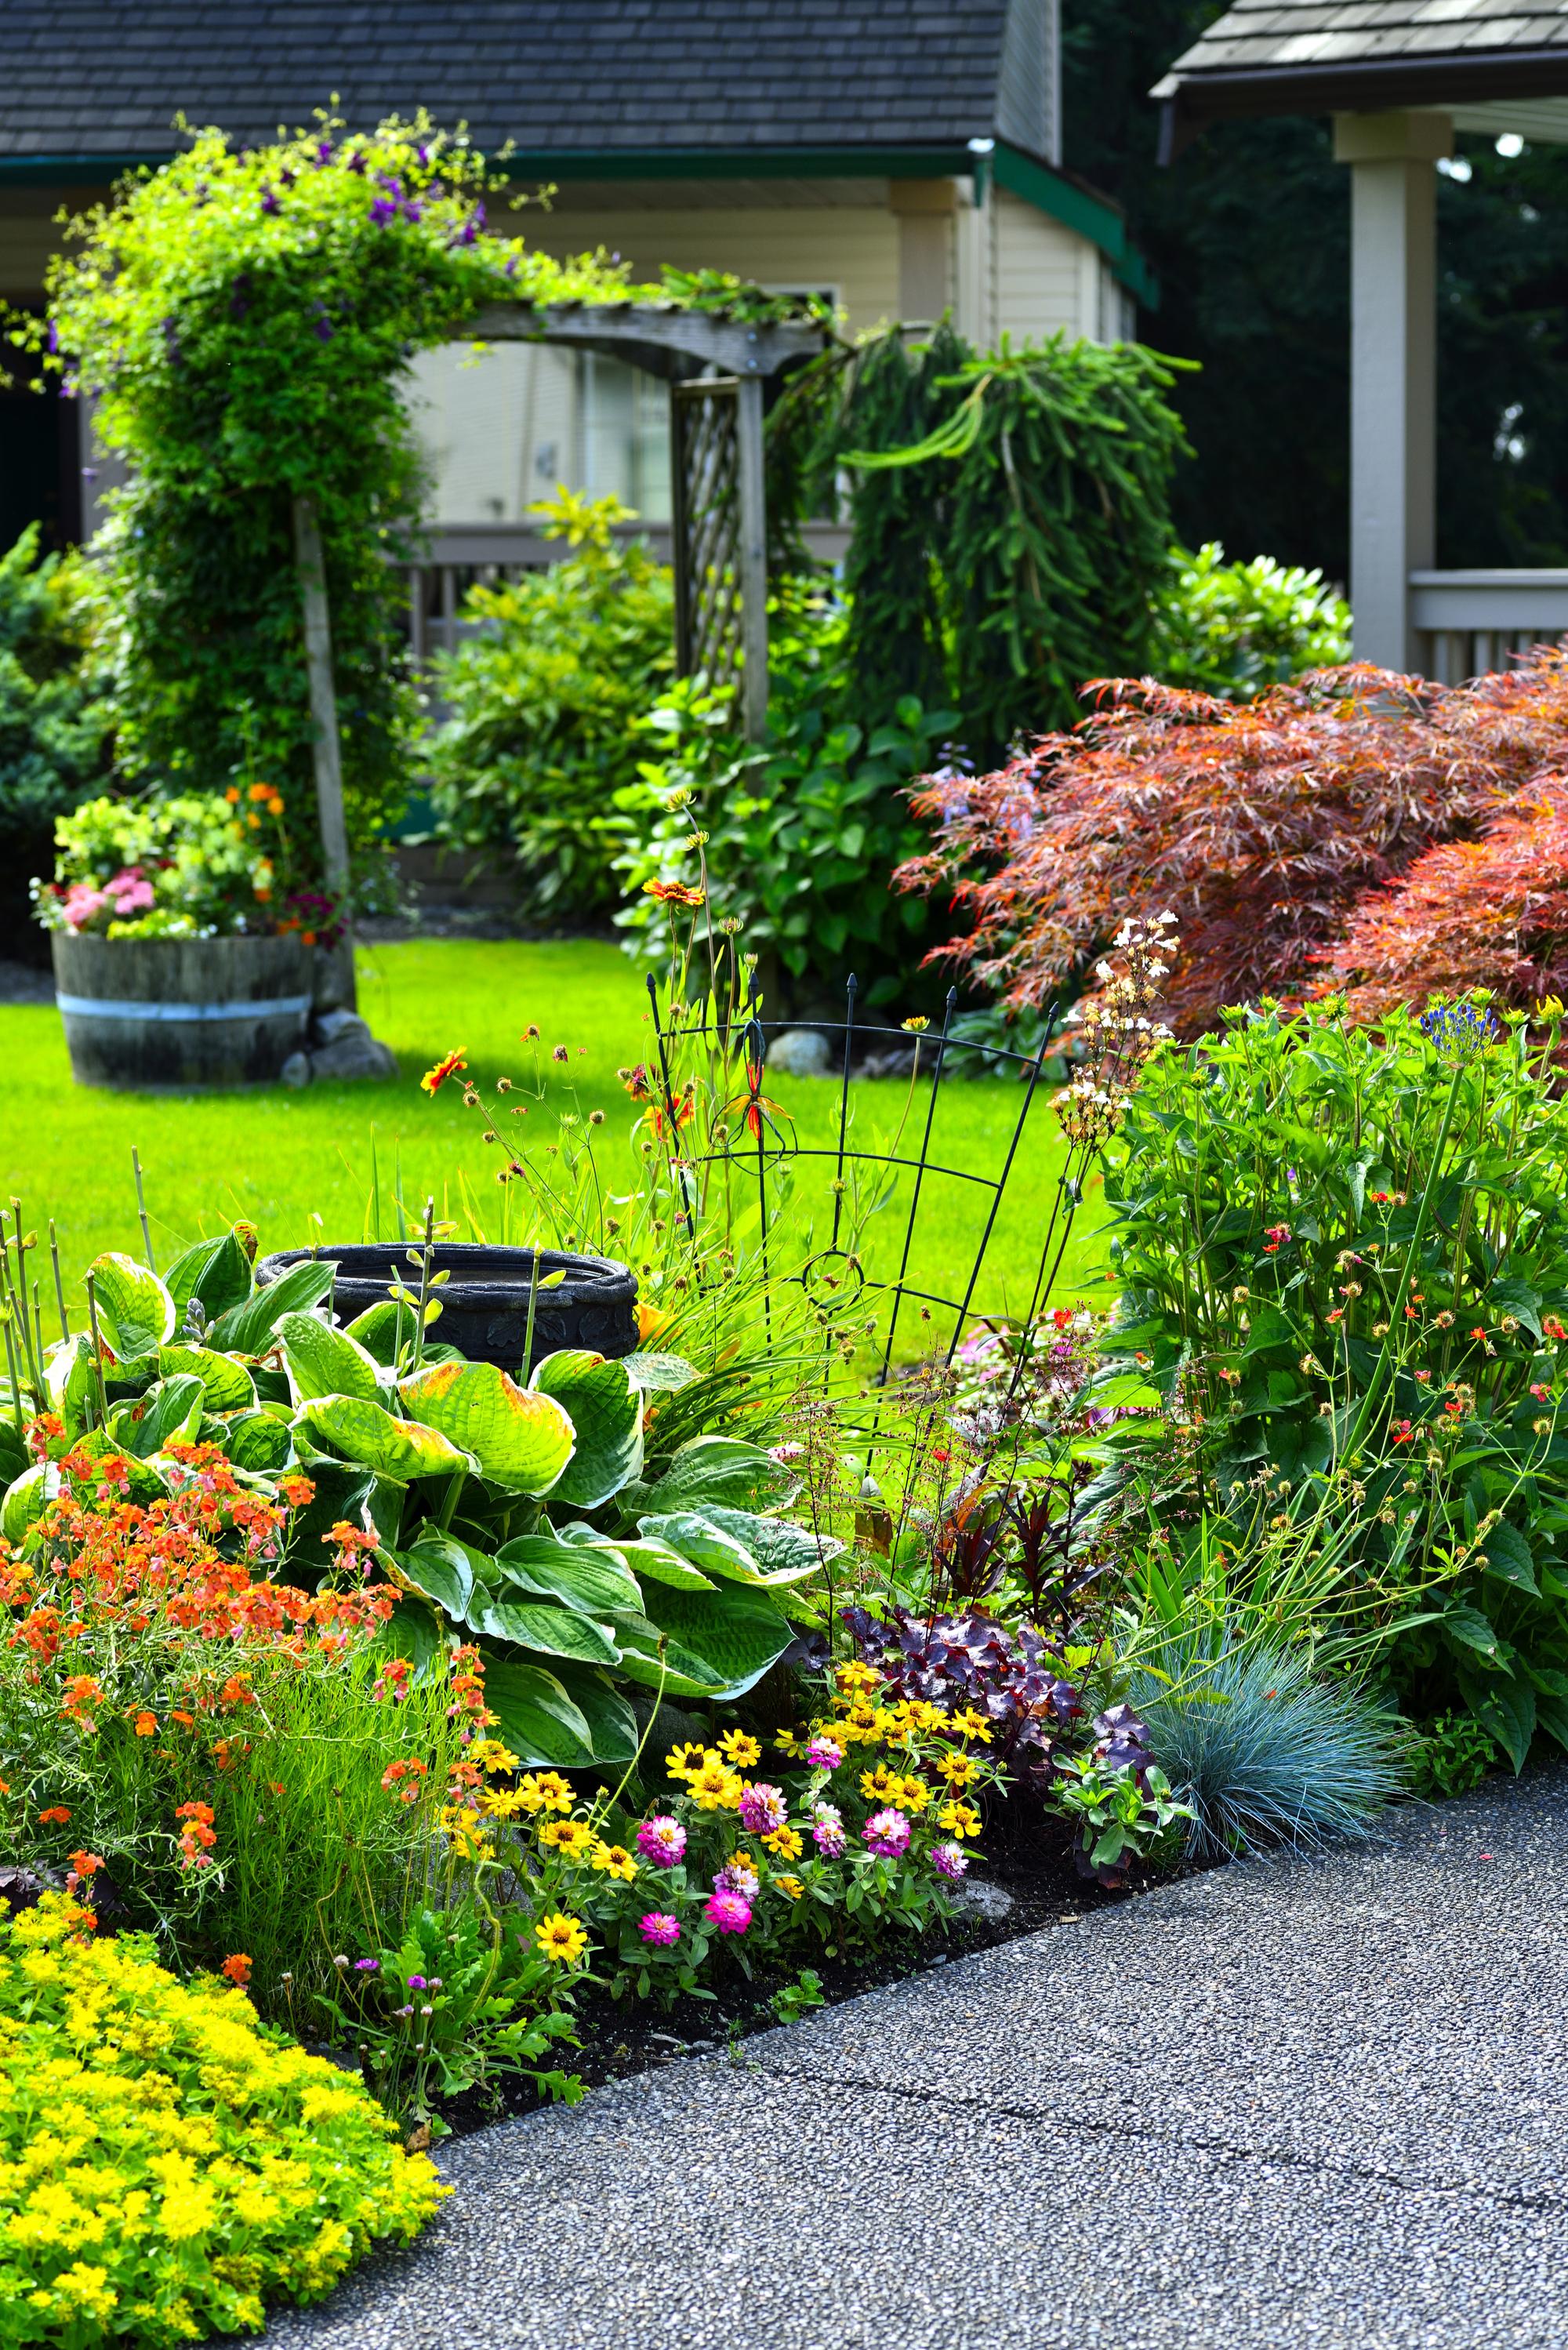 june | garden | gardening | june gardening tips | gardening tips | tips for gardening in june | june gardening